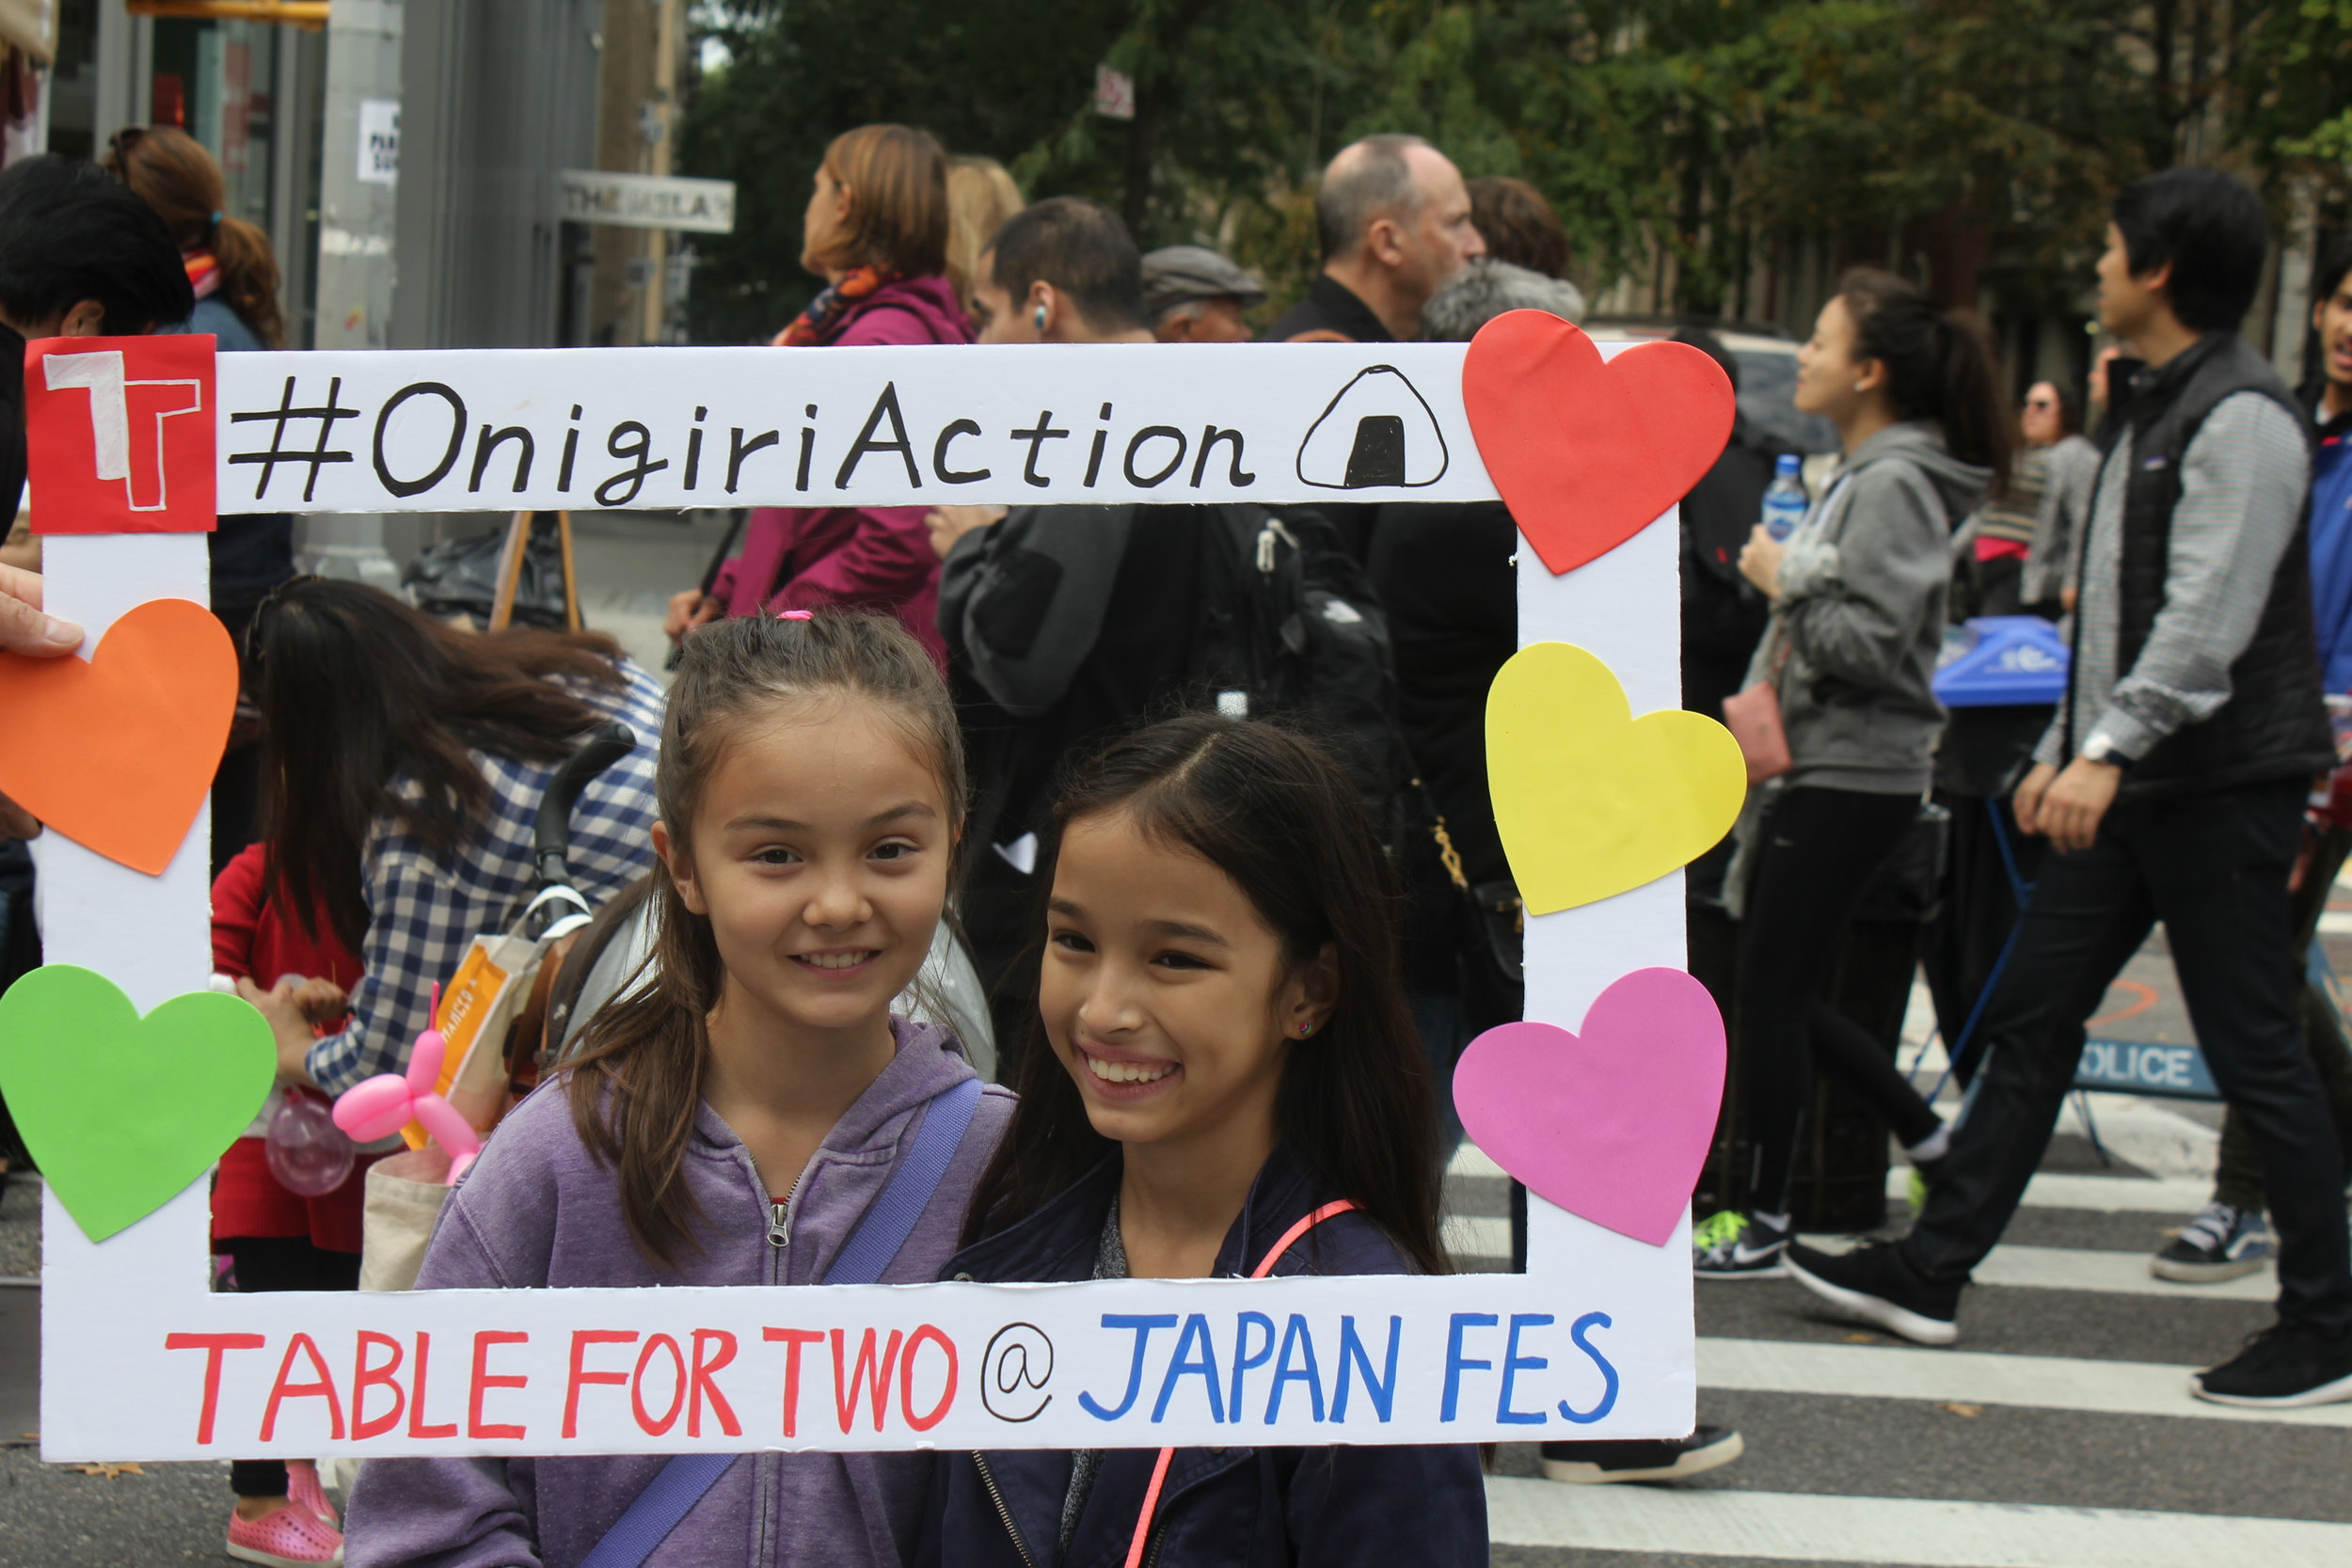 Onigiri Action